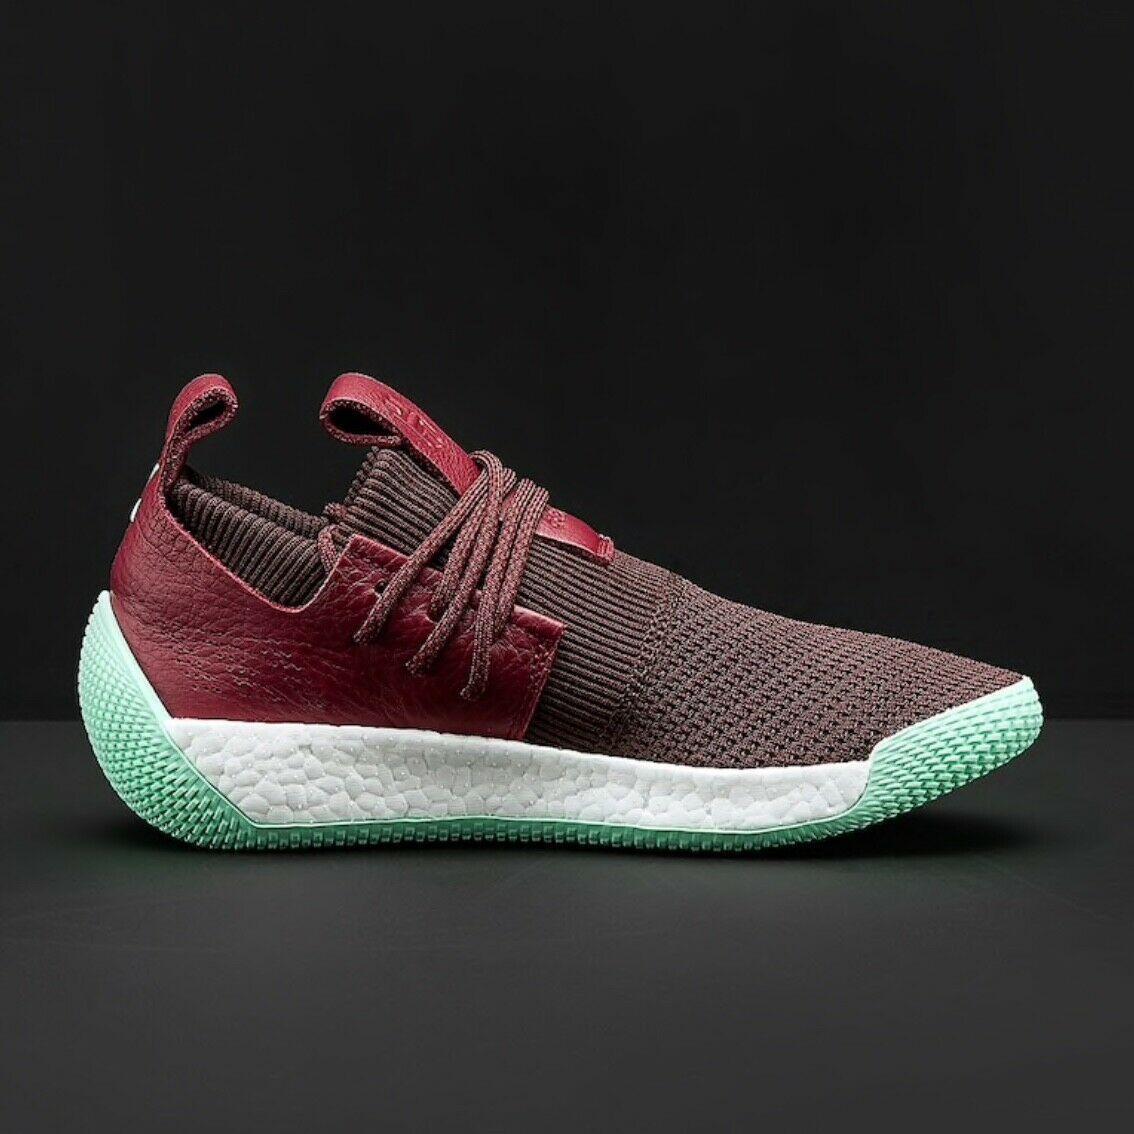 Adidas James Harden LS 2 Lace CG6277